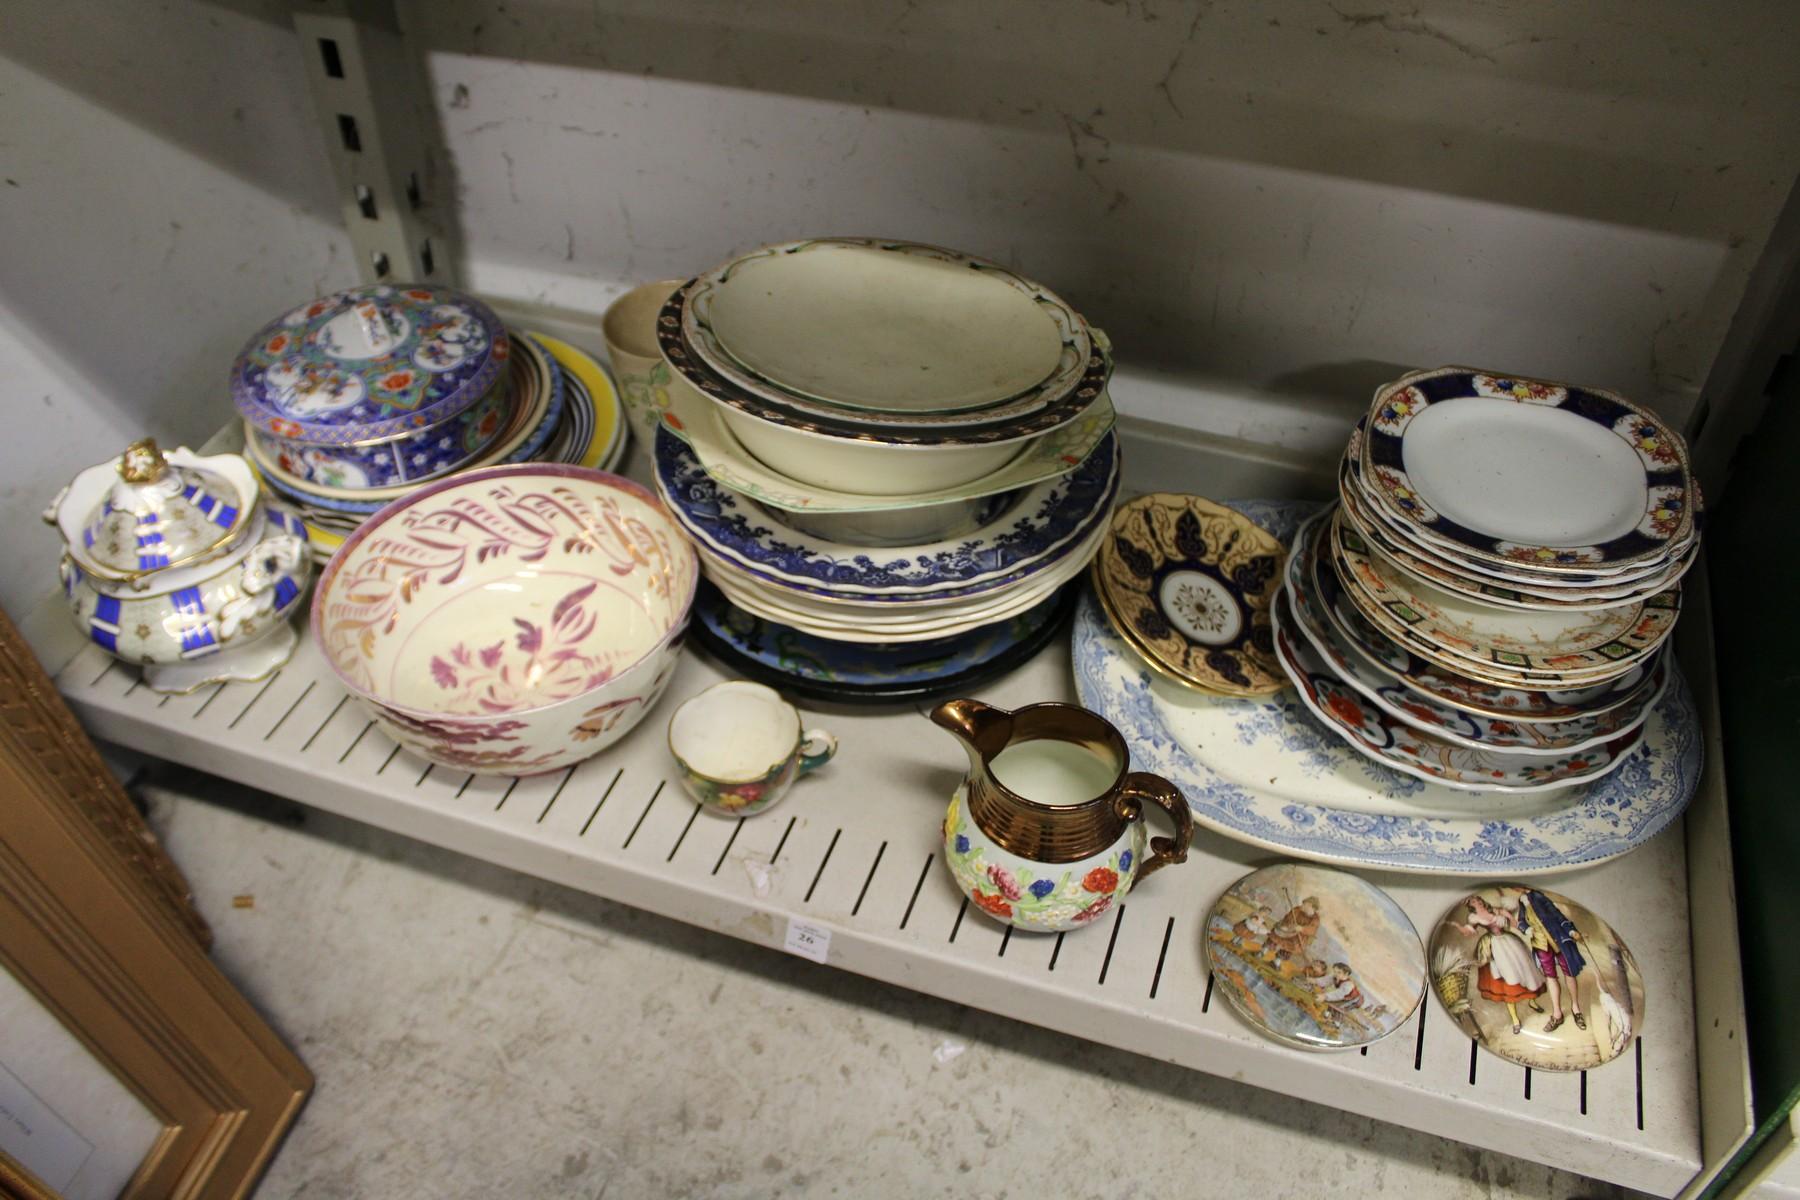 A shelf of decorative china. - Image 2 of 2